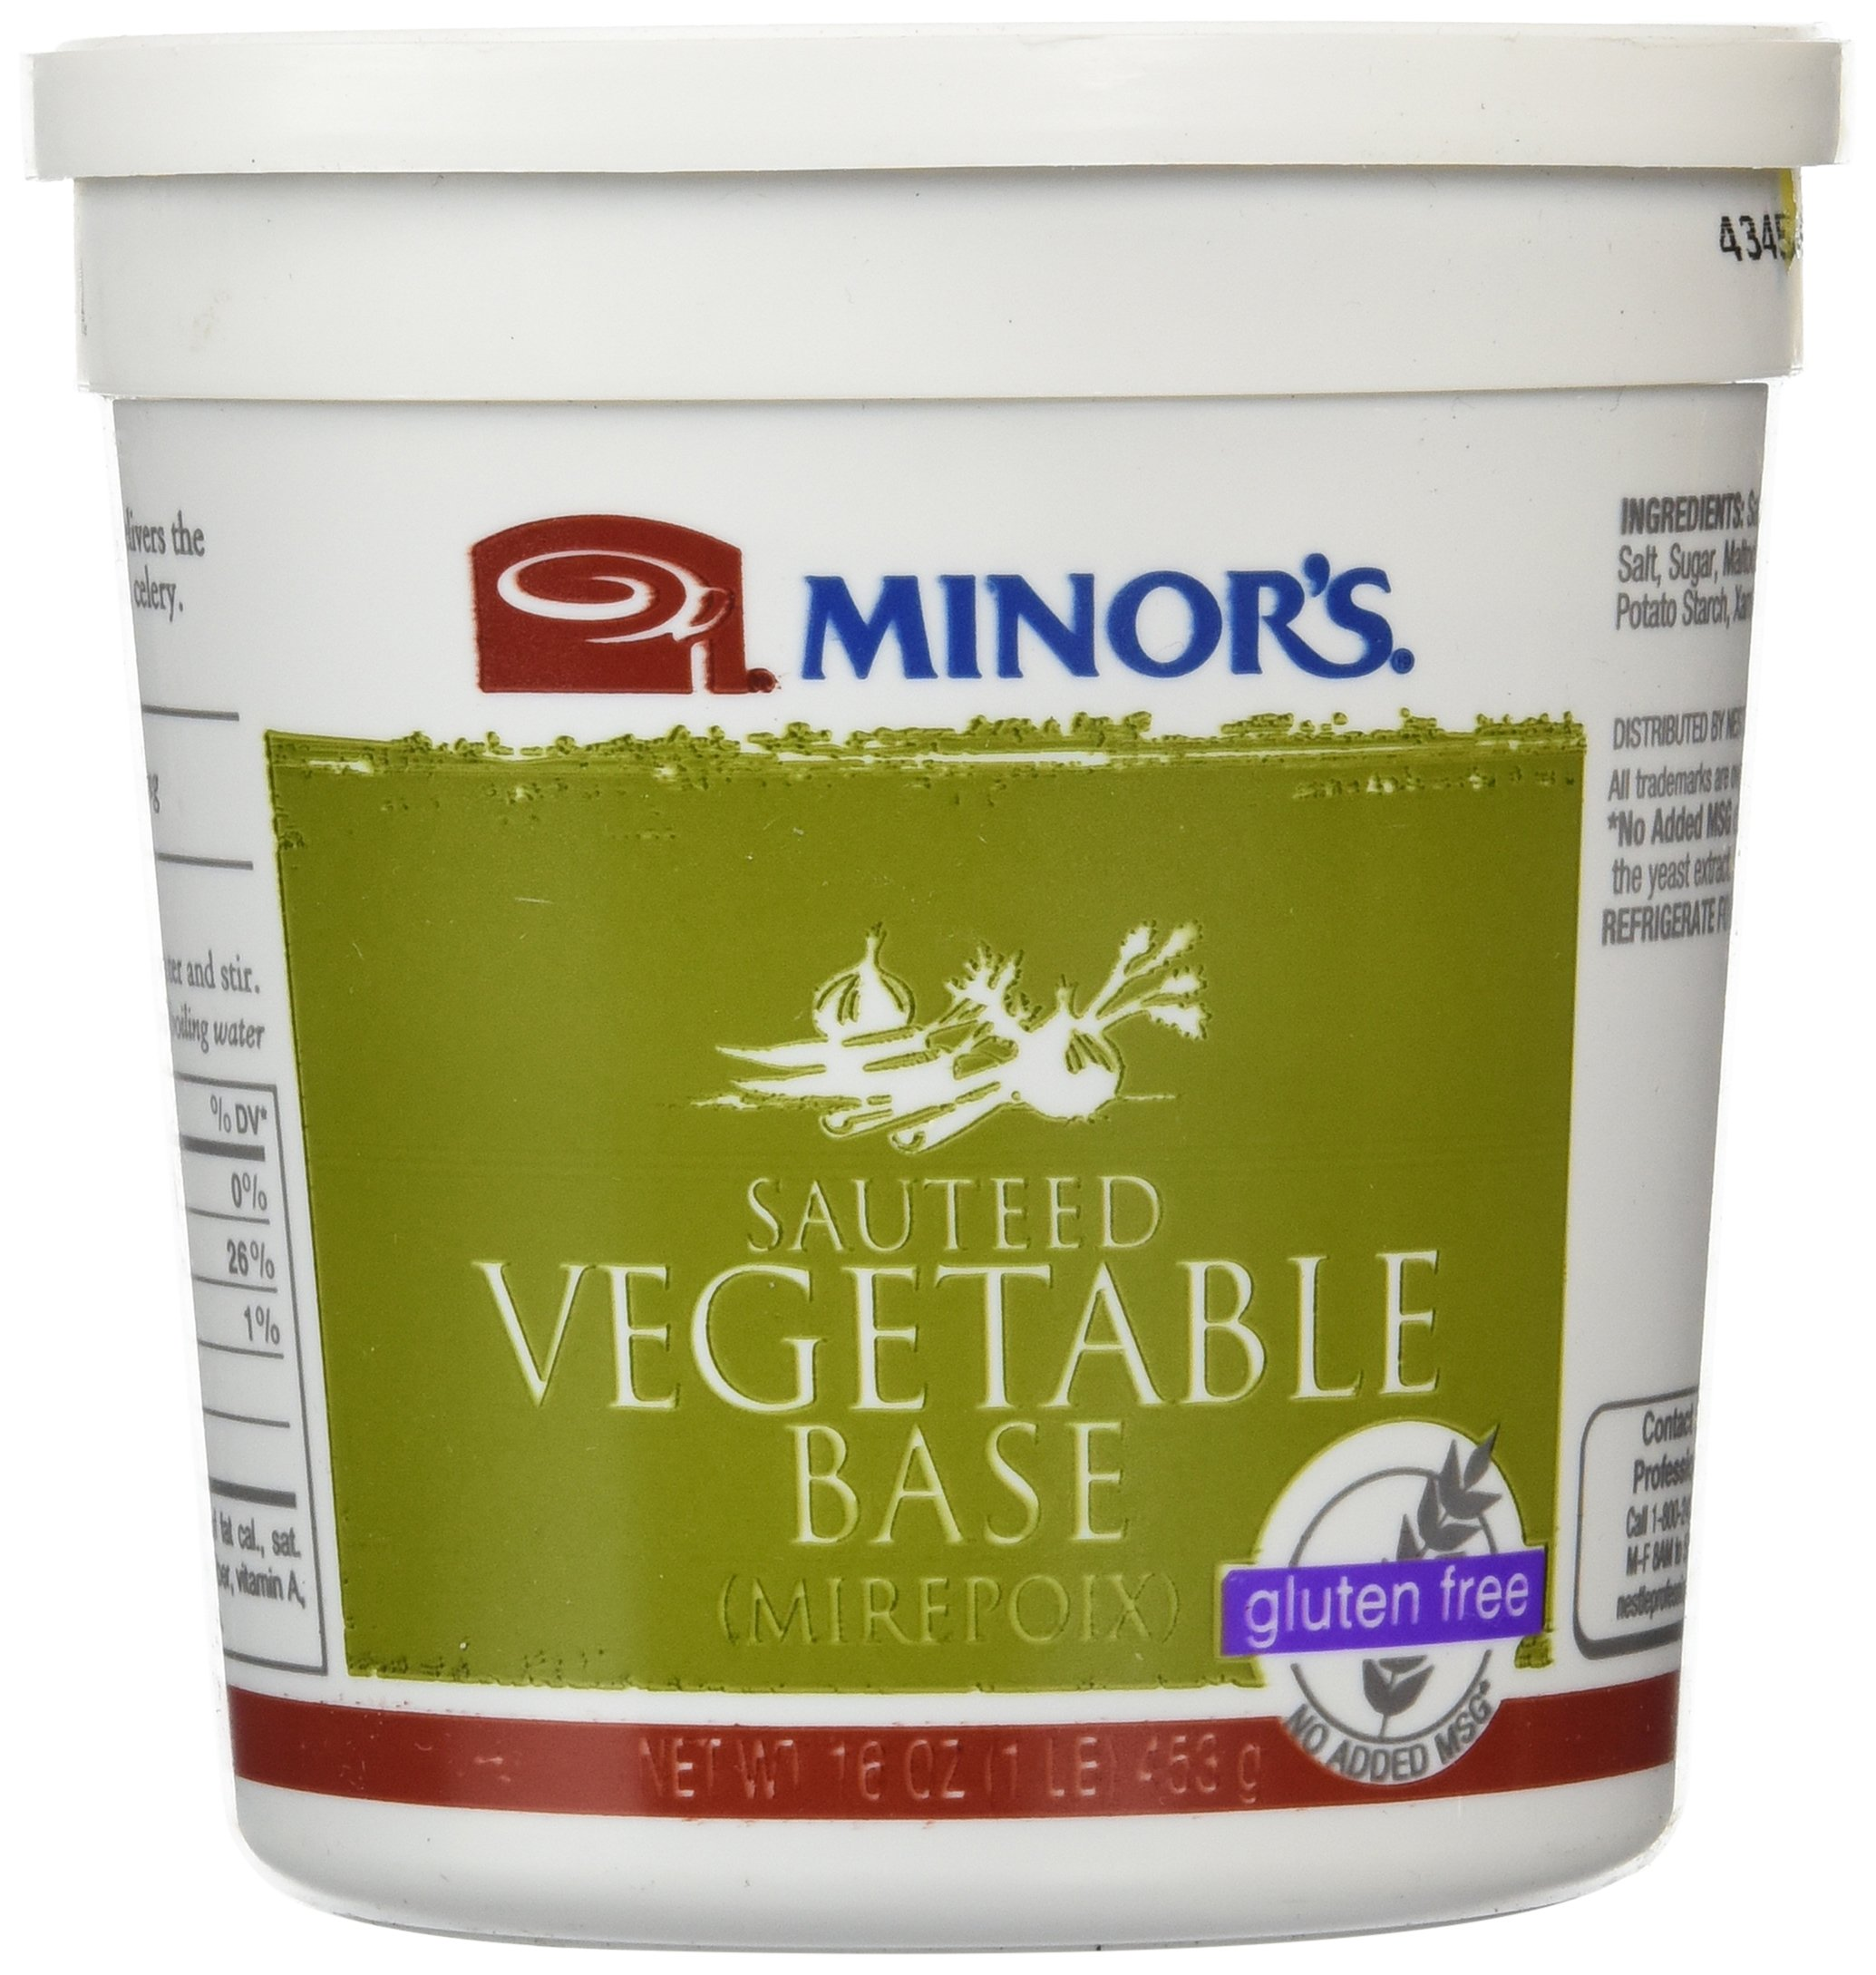 Minor's Sauteed Vegetable Base, 16 Ounce